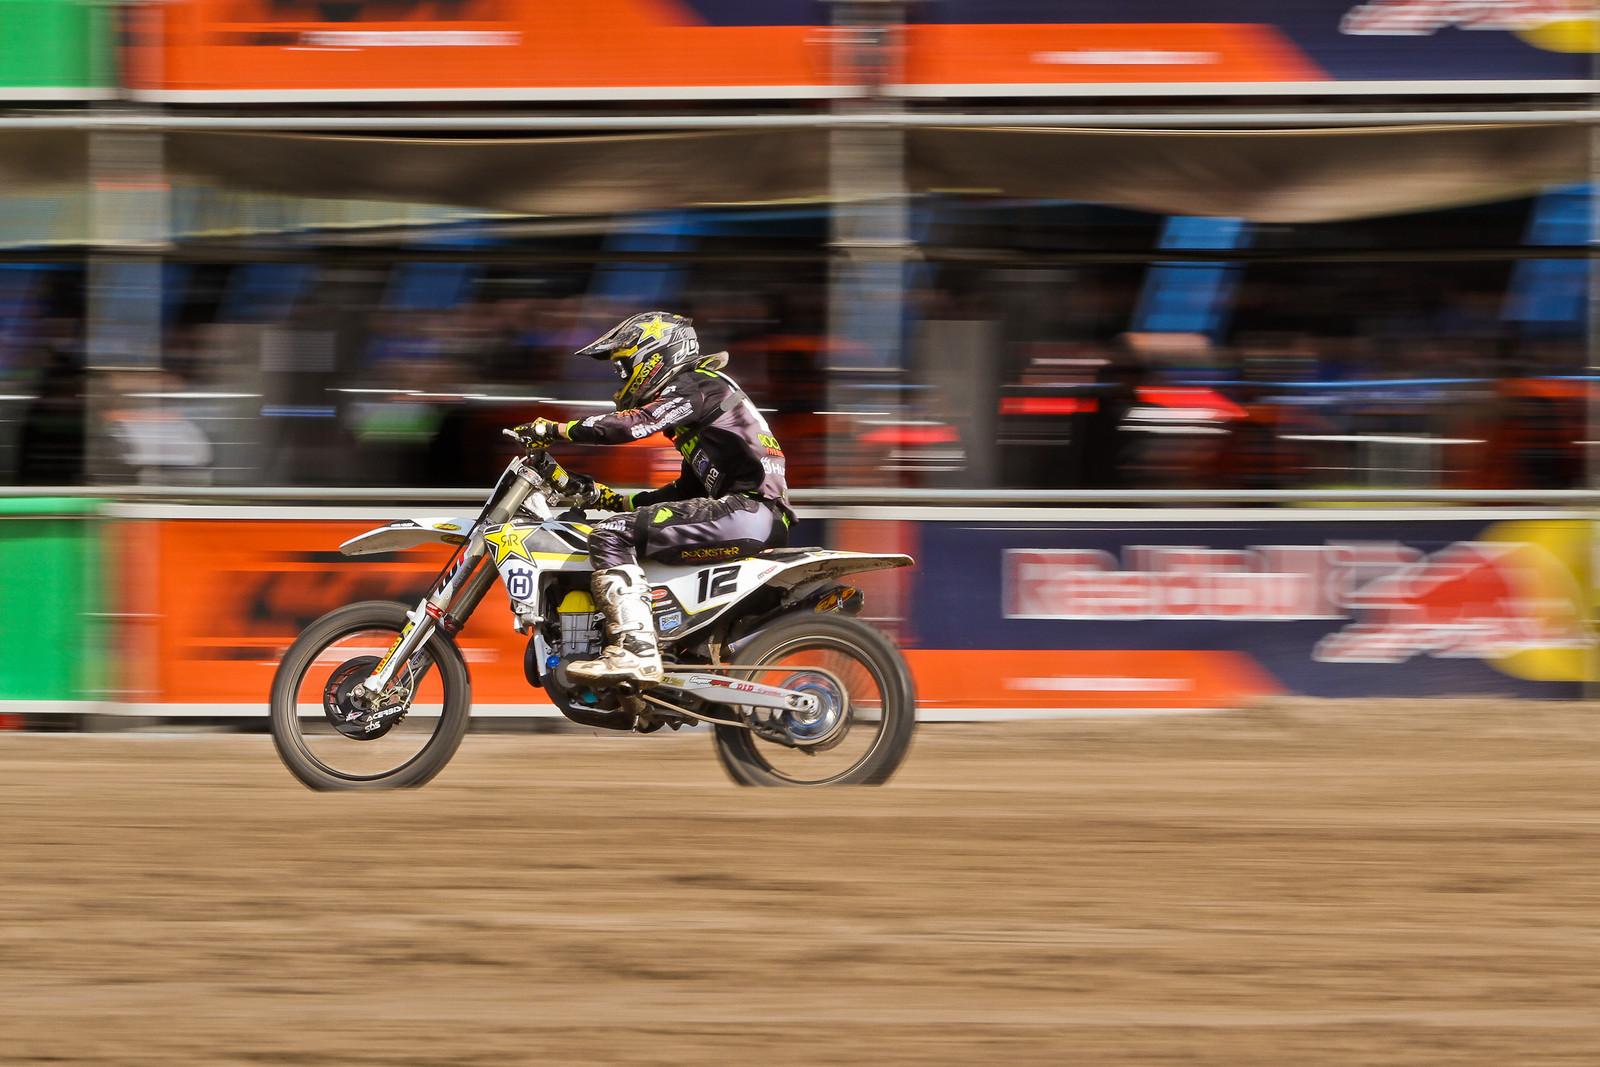 Max Nagl - ayearinmx - Motocross Pictures - Vital MX